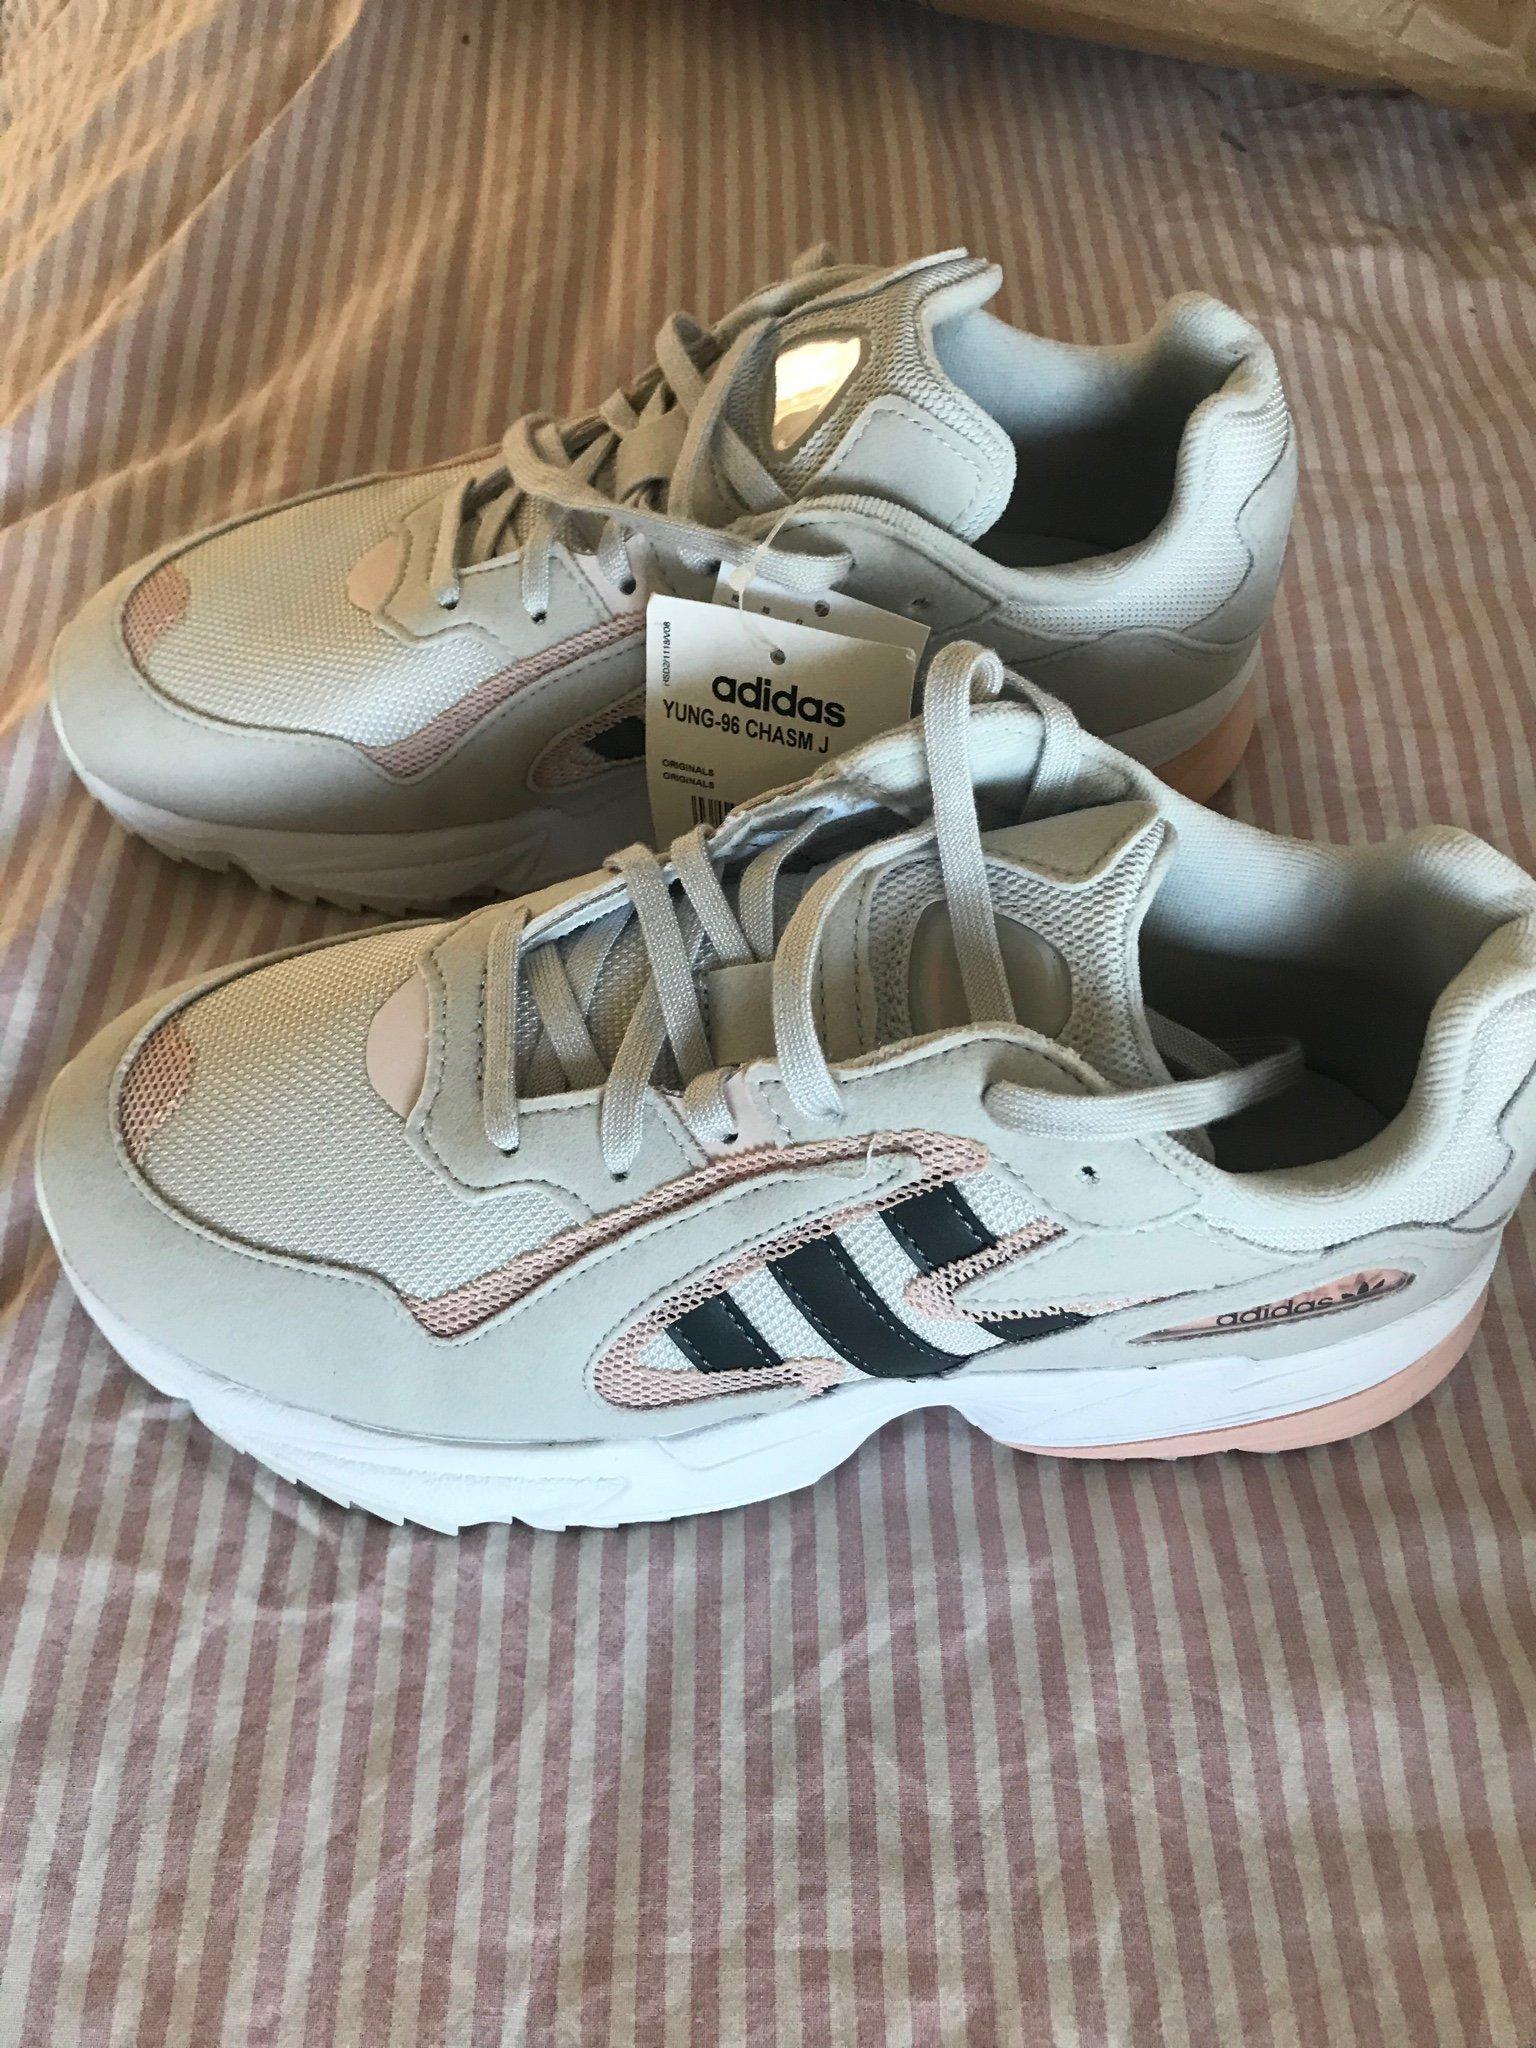 Adidas dam